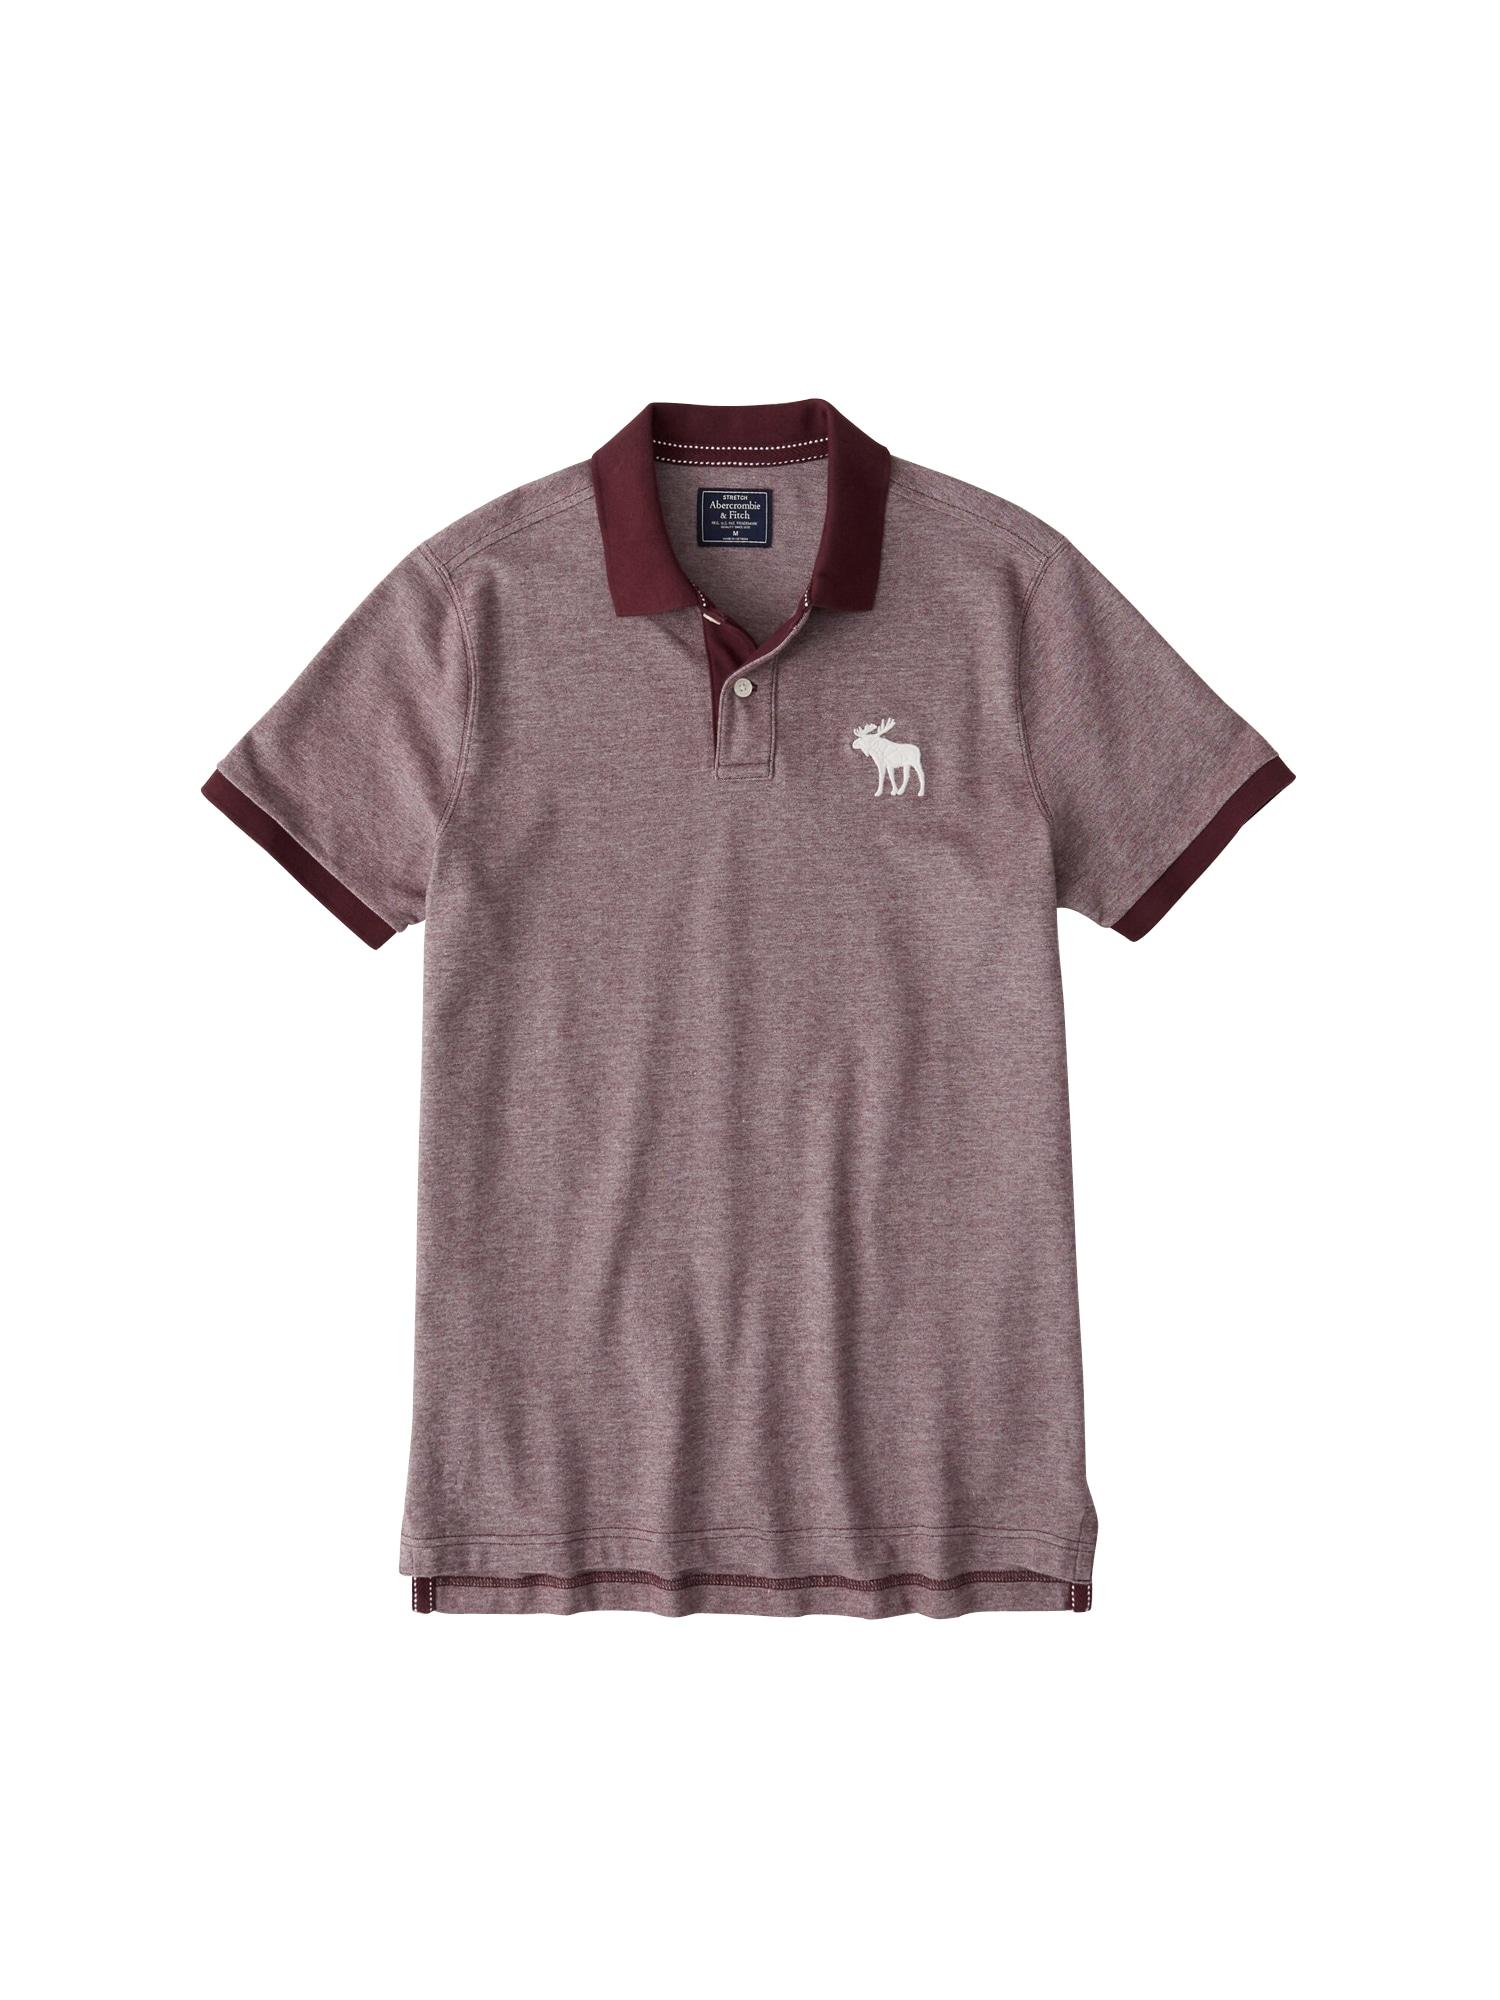 Abercrombie & Fitch Marškinėliai ' BTS19-SS EXPLODED' burgundiško vyno spalva